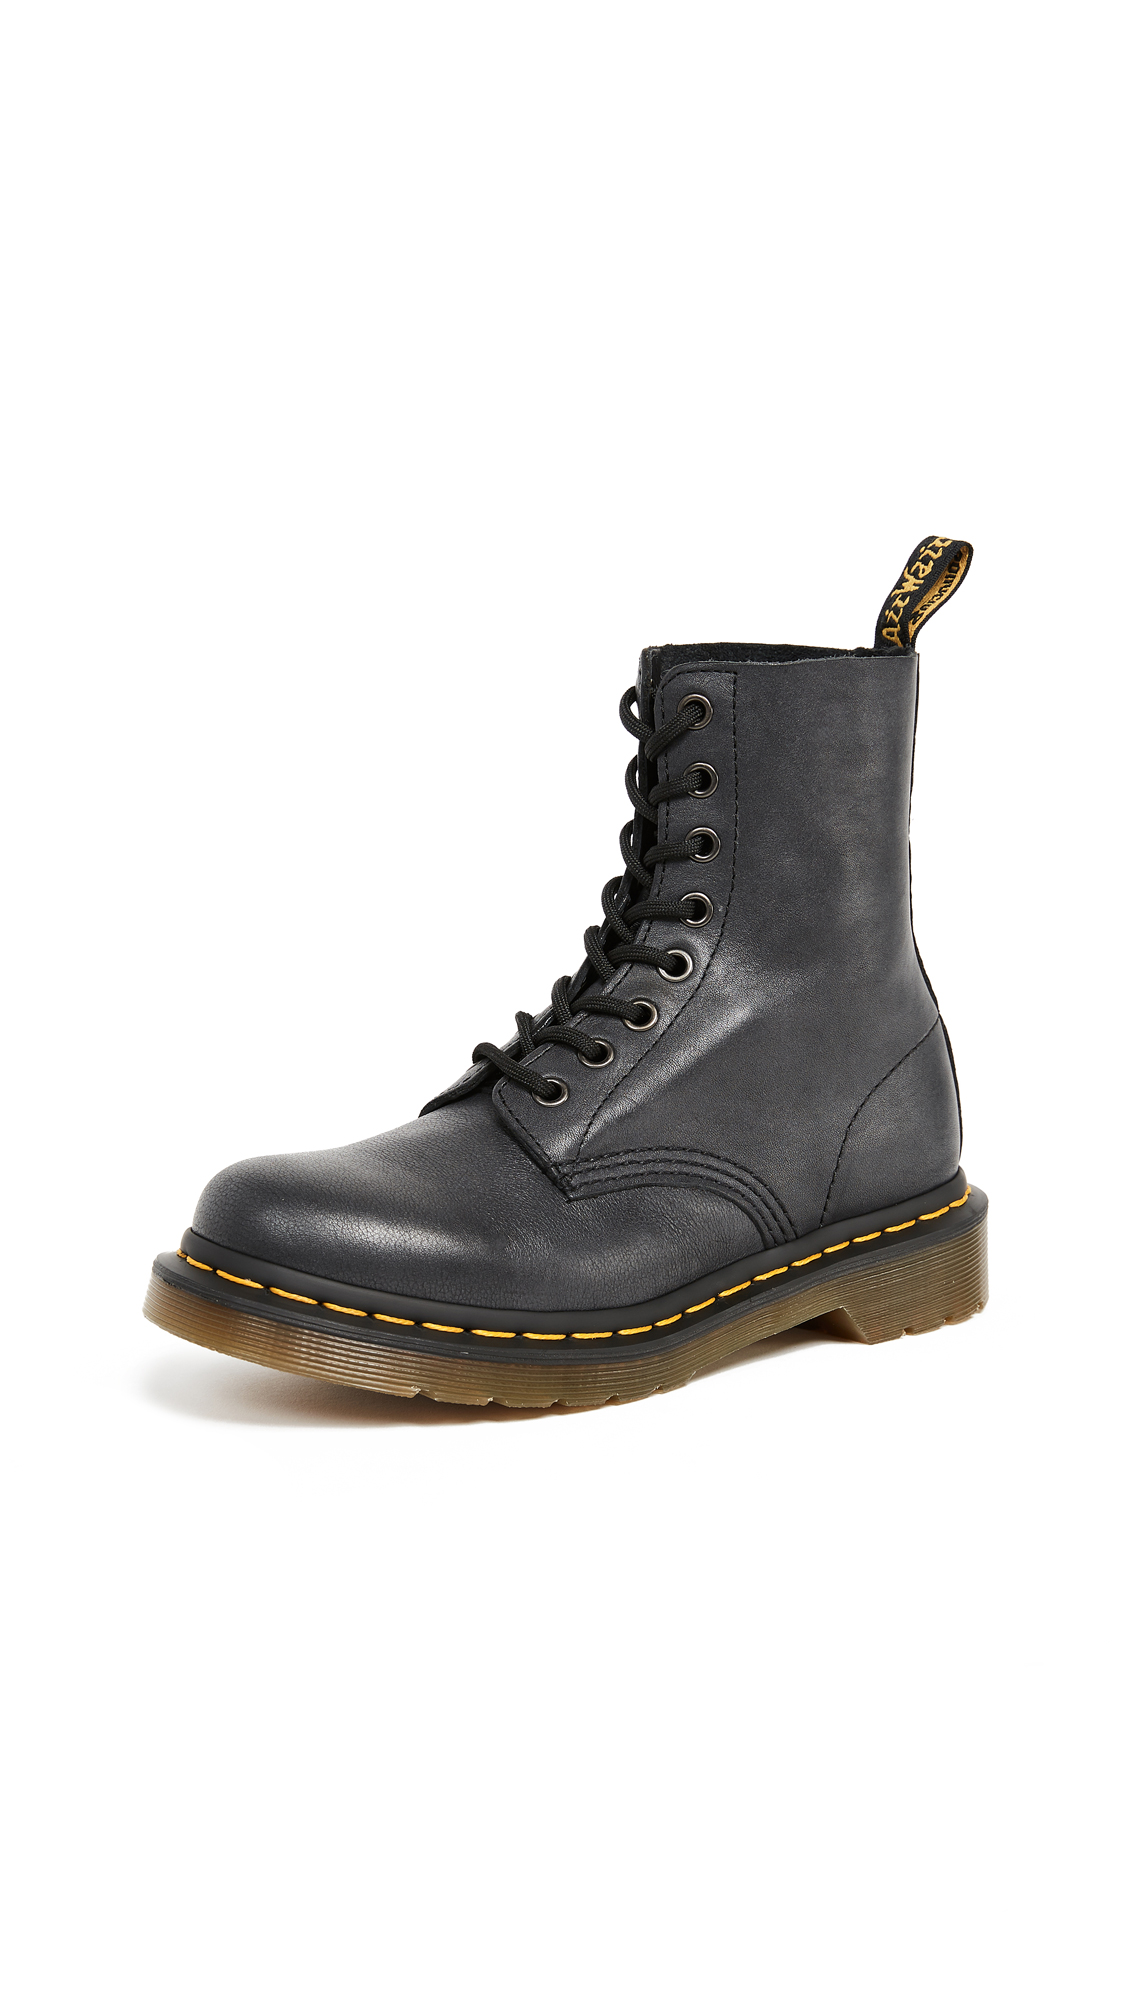 Dr. Martens Pascal 8 Eye Boots - Black